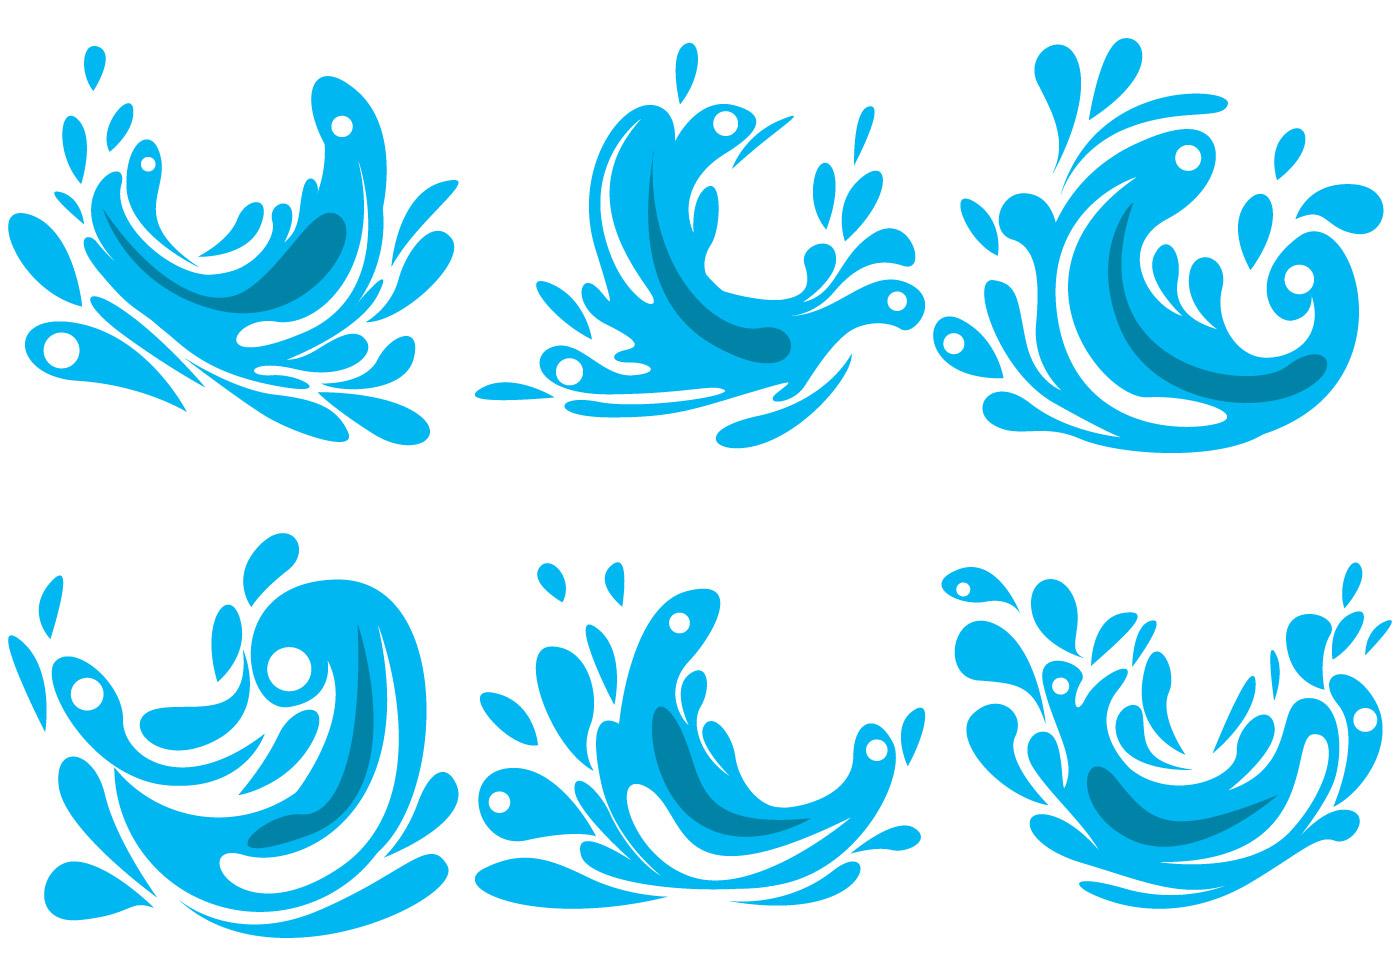 Agua Vector - Download Free Vector Art, Stock Graphics ...